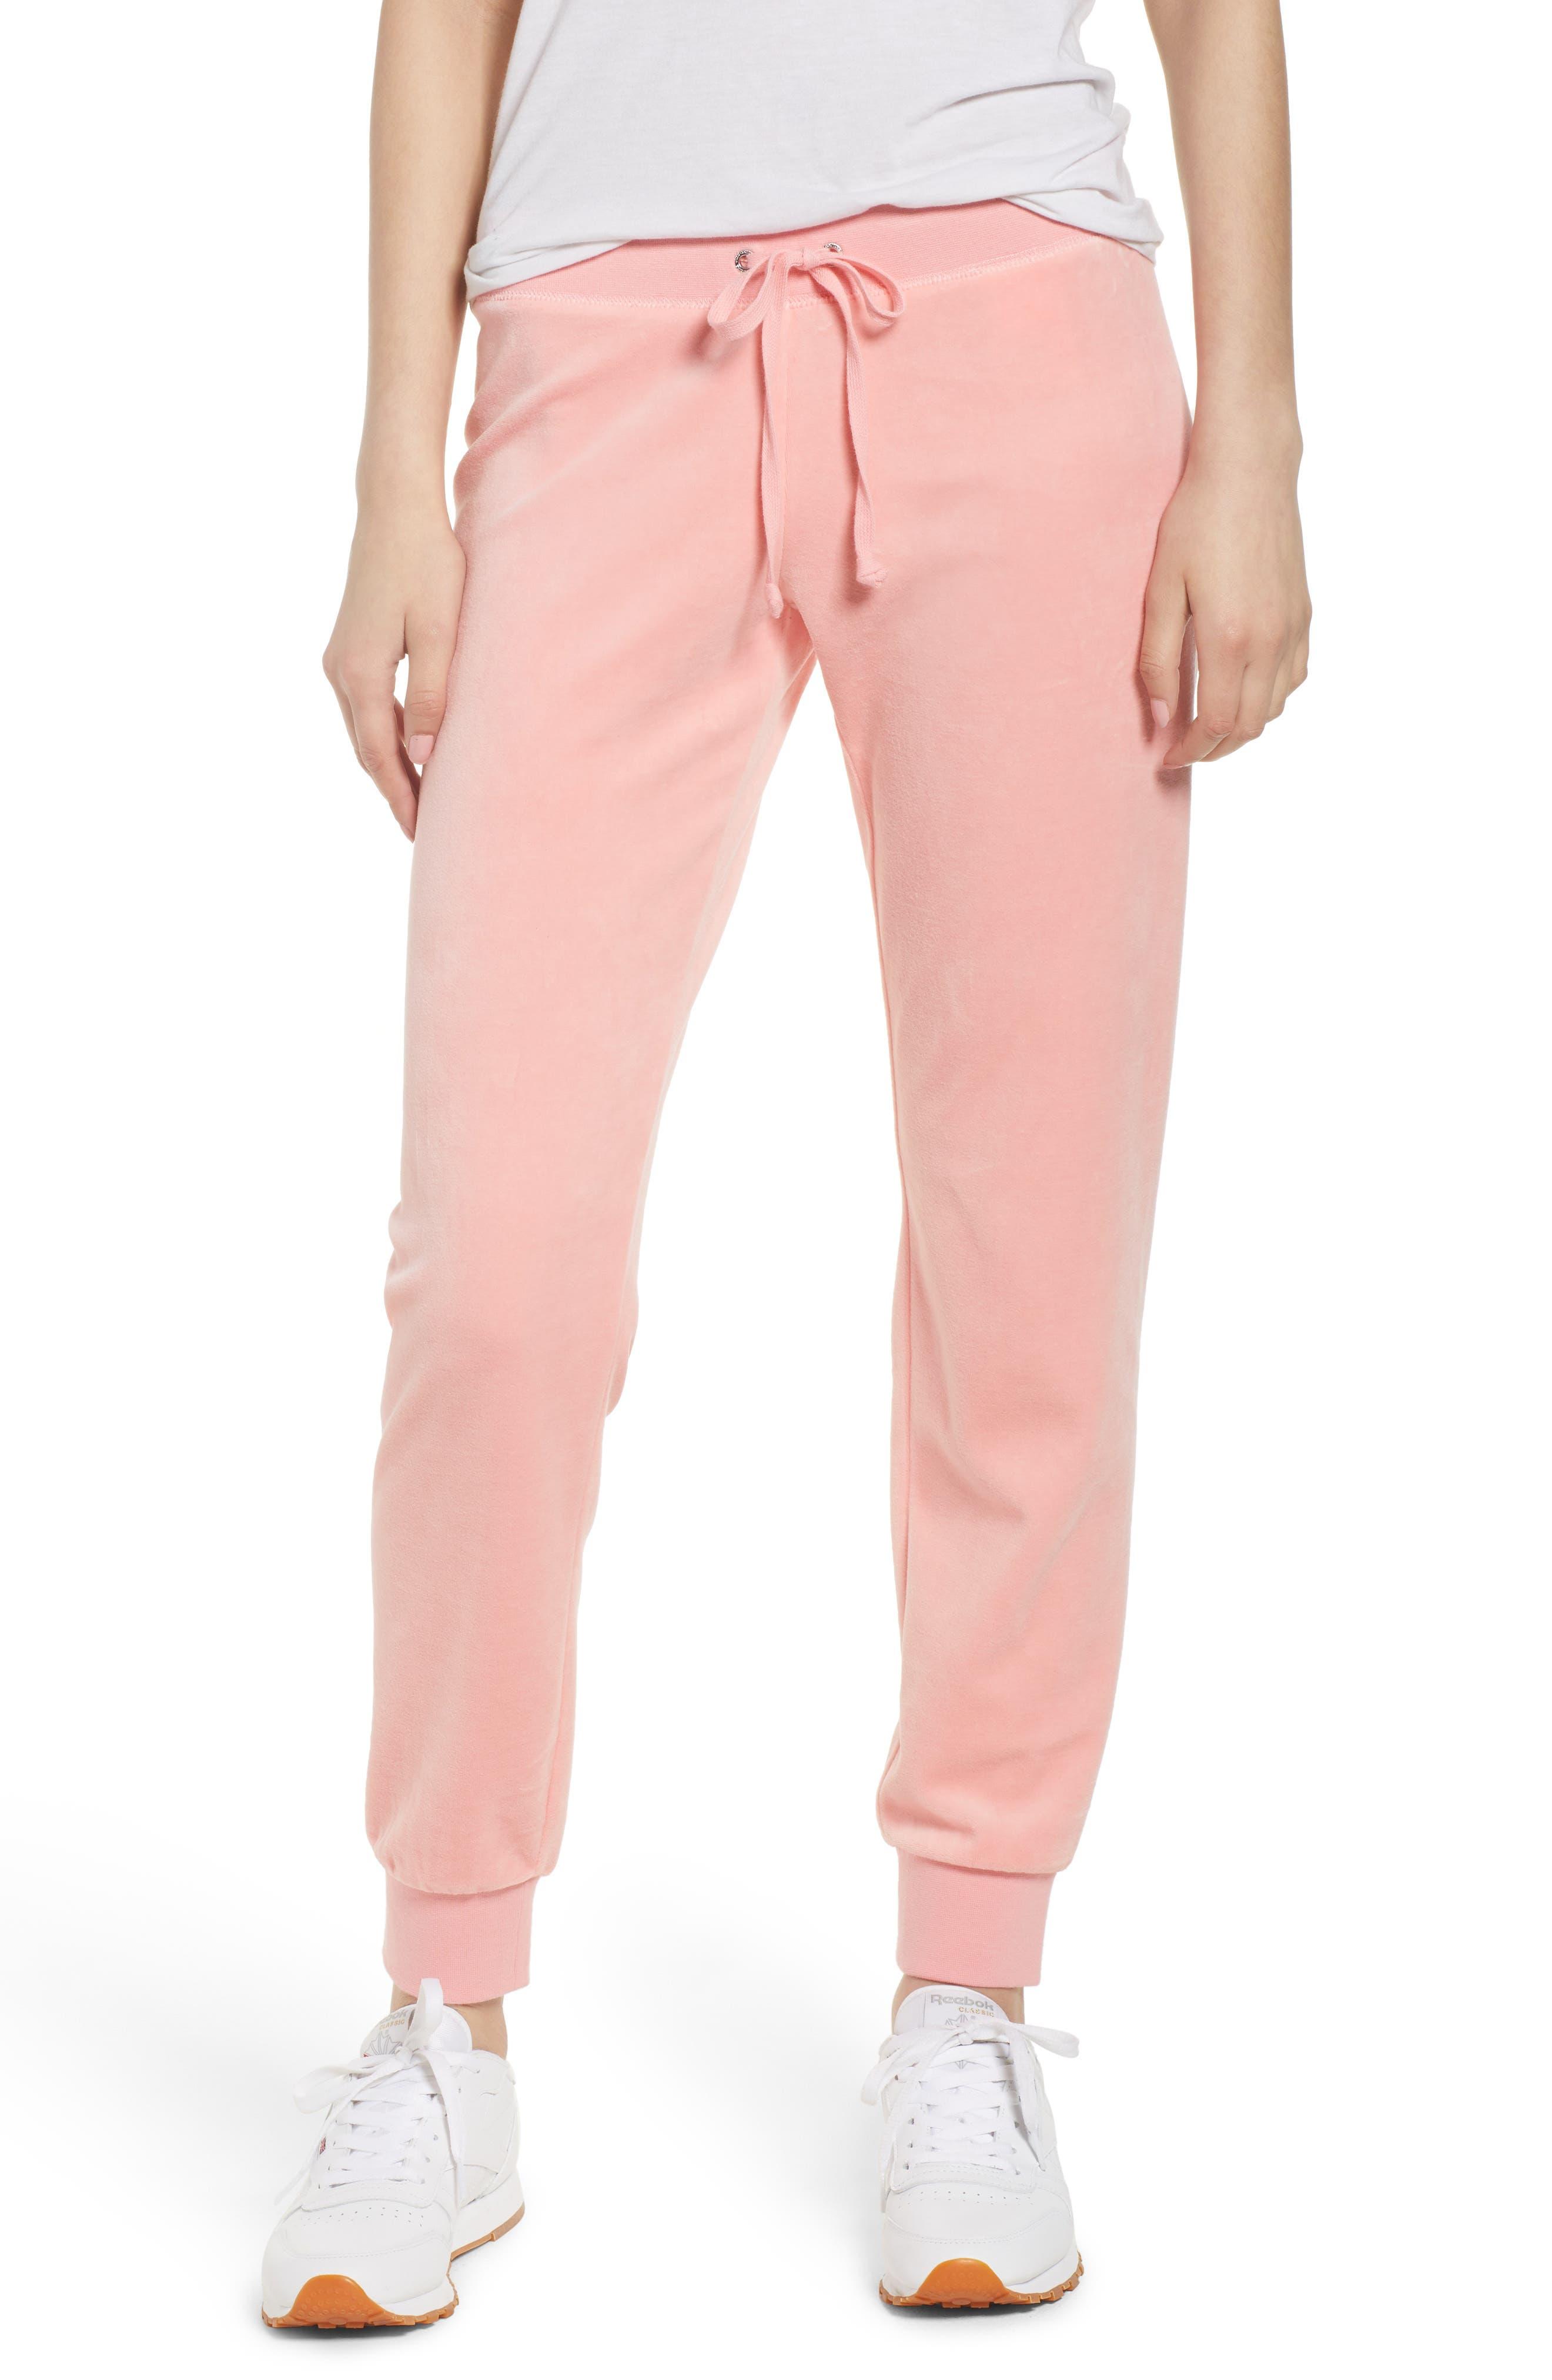 Zuma Velour Track Pants,                             Main thumbnail 1, color,                             Sorbet Pink